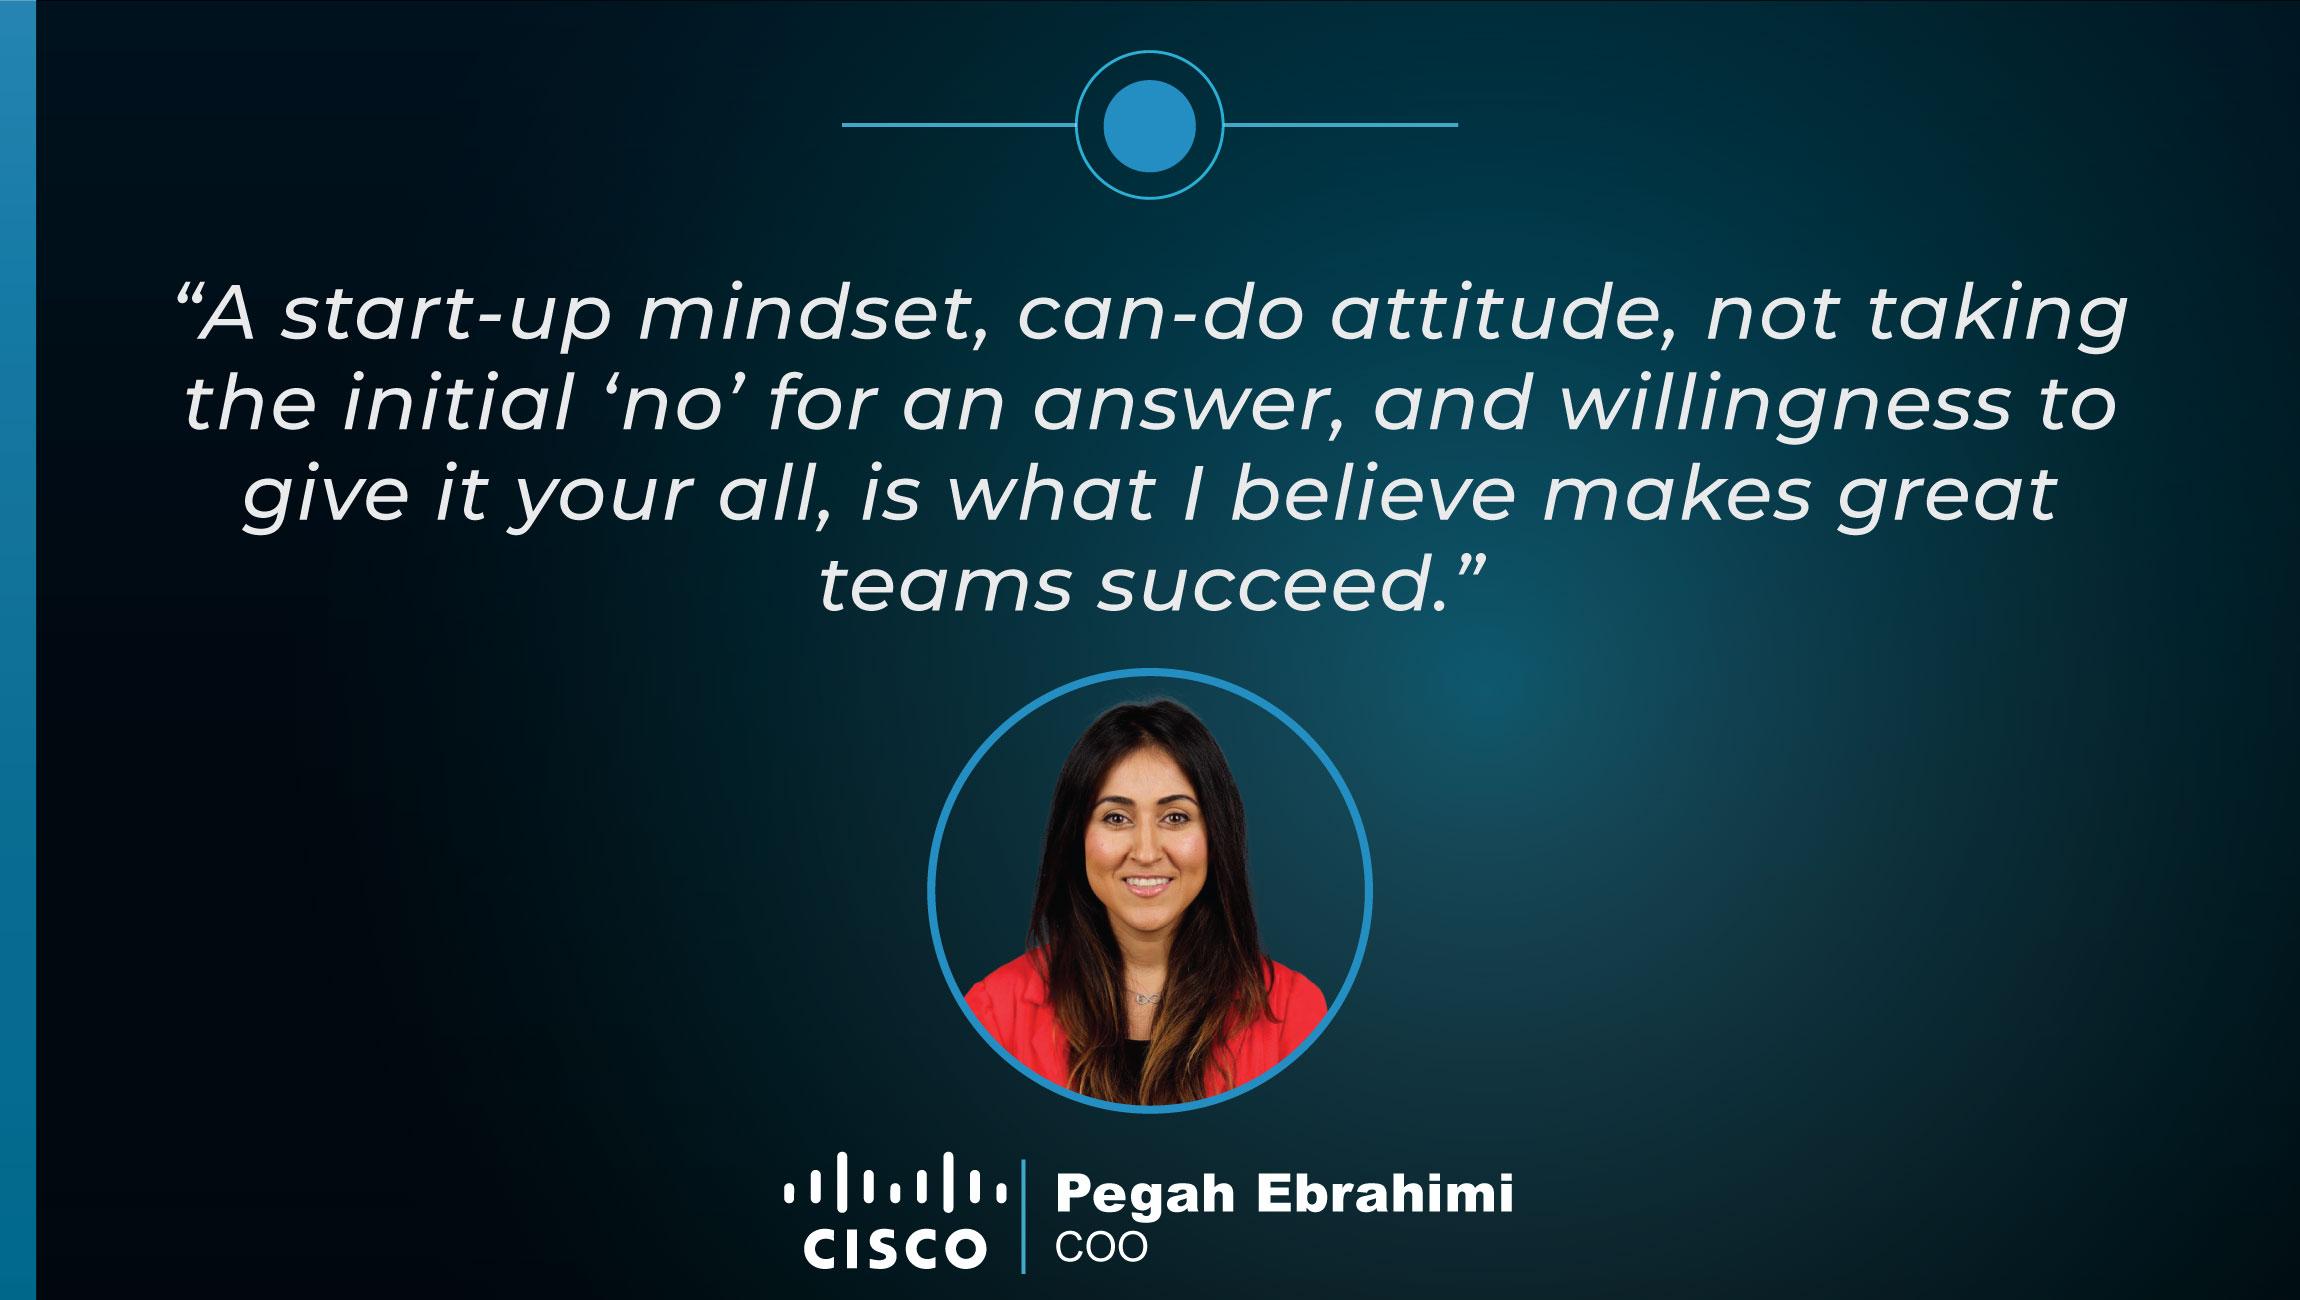 TechBytes with Pegah Ebrahimi, COO at Cisco